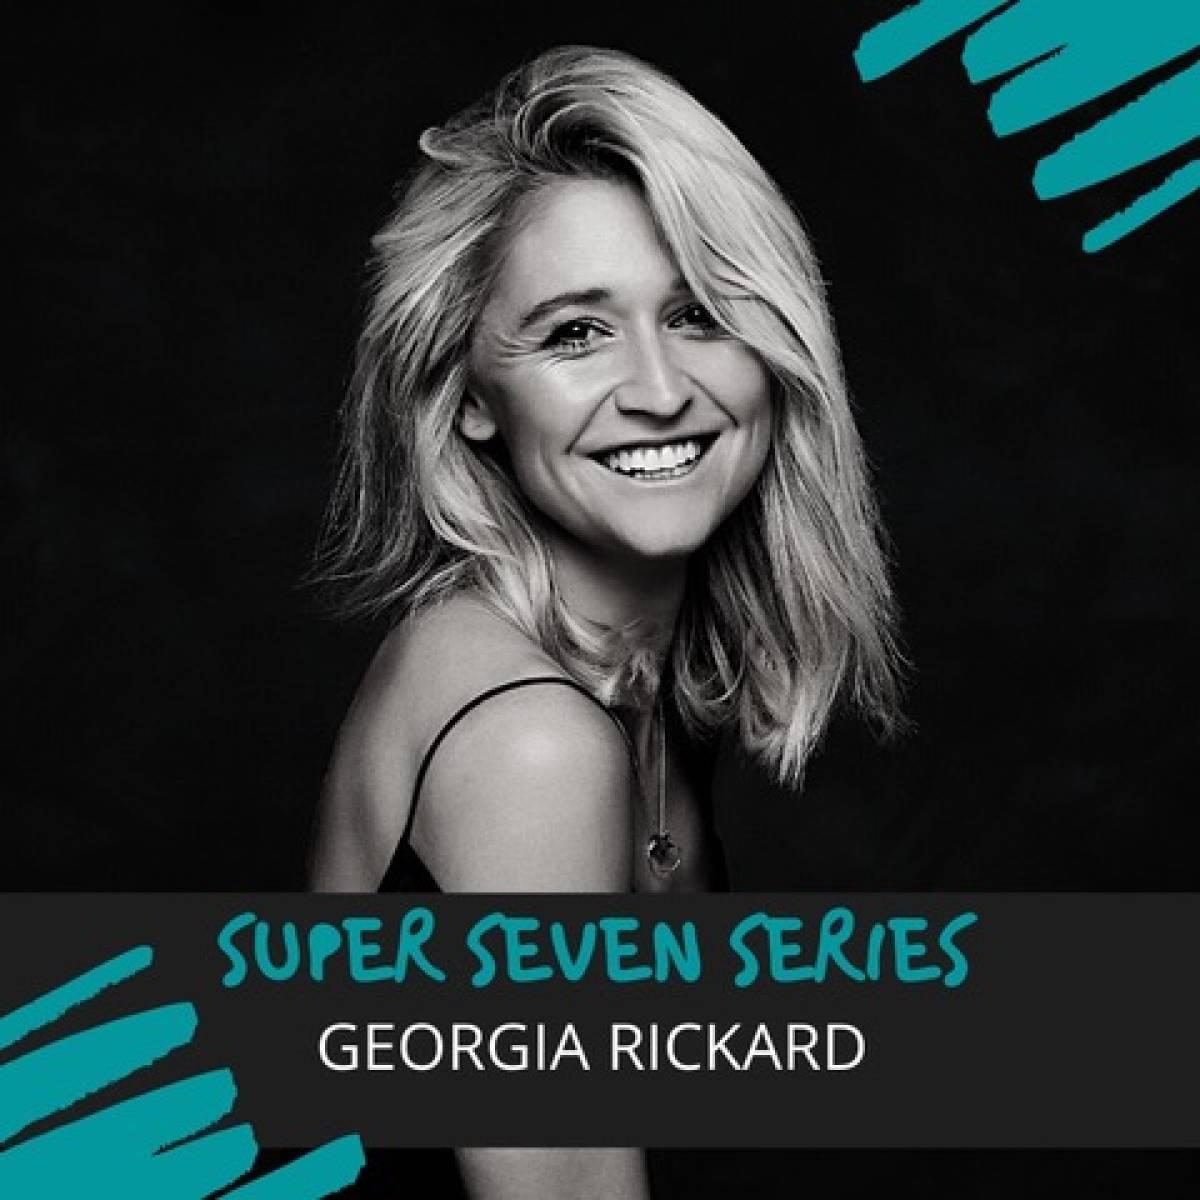 Georgia Rickard featured in Super Seven Series at TellMeWhere2Go